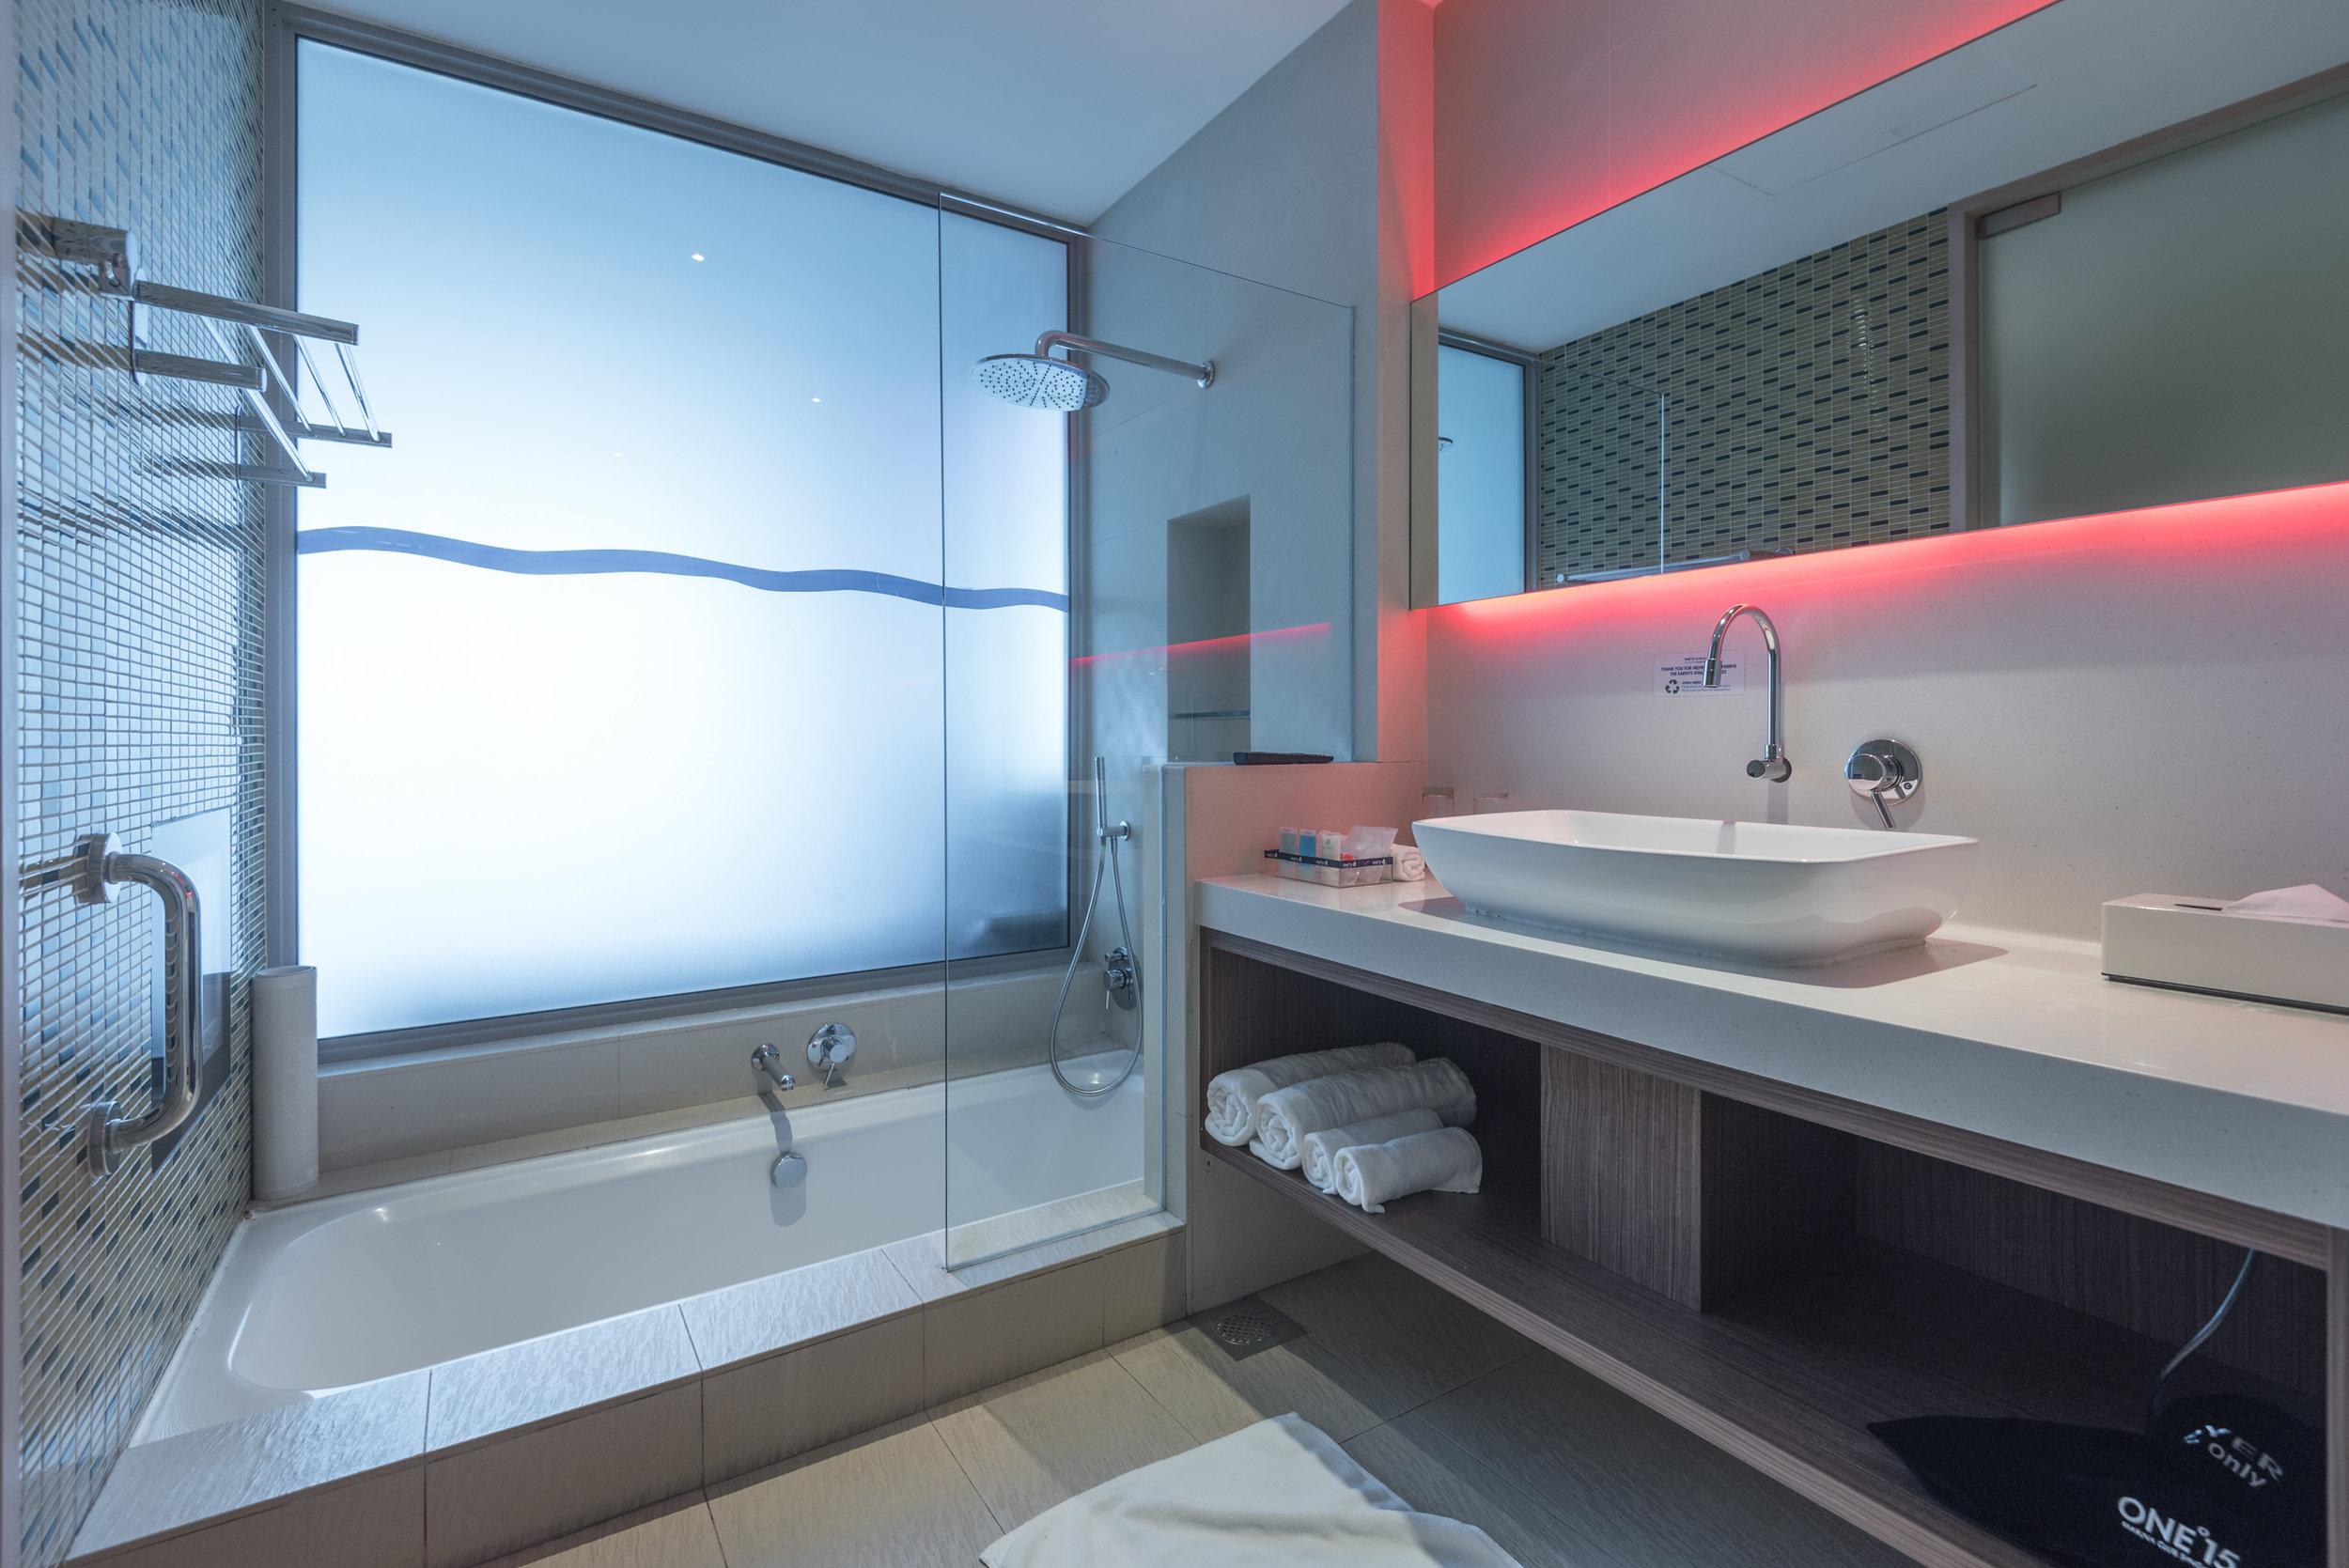 Bathtub with TV  Marina View Room - ONE°15 Marina Club